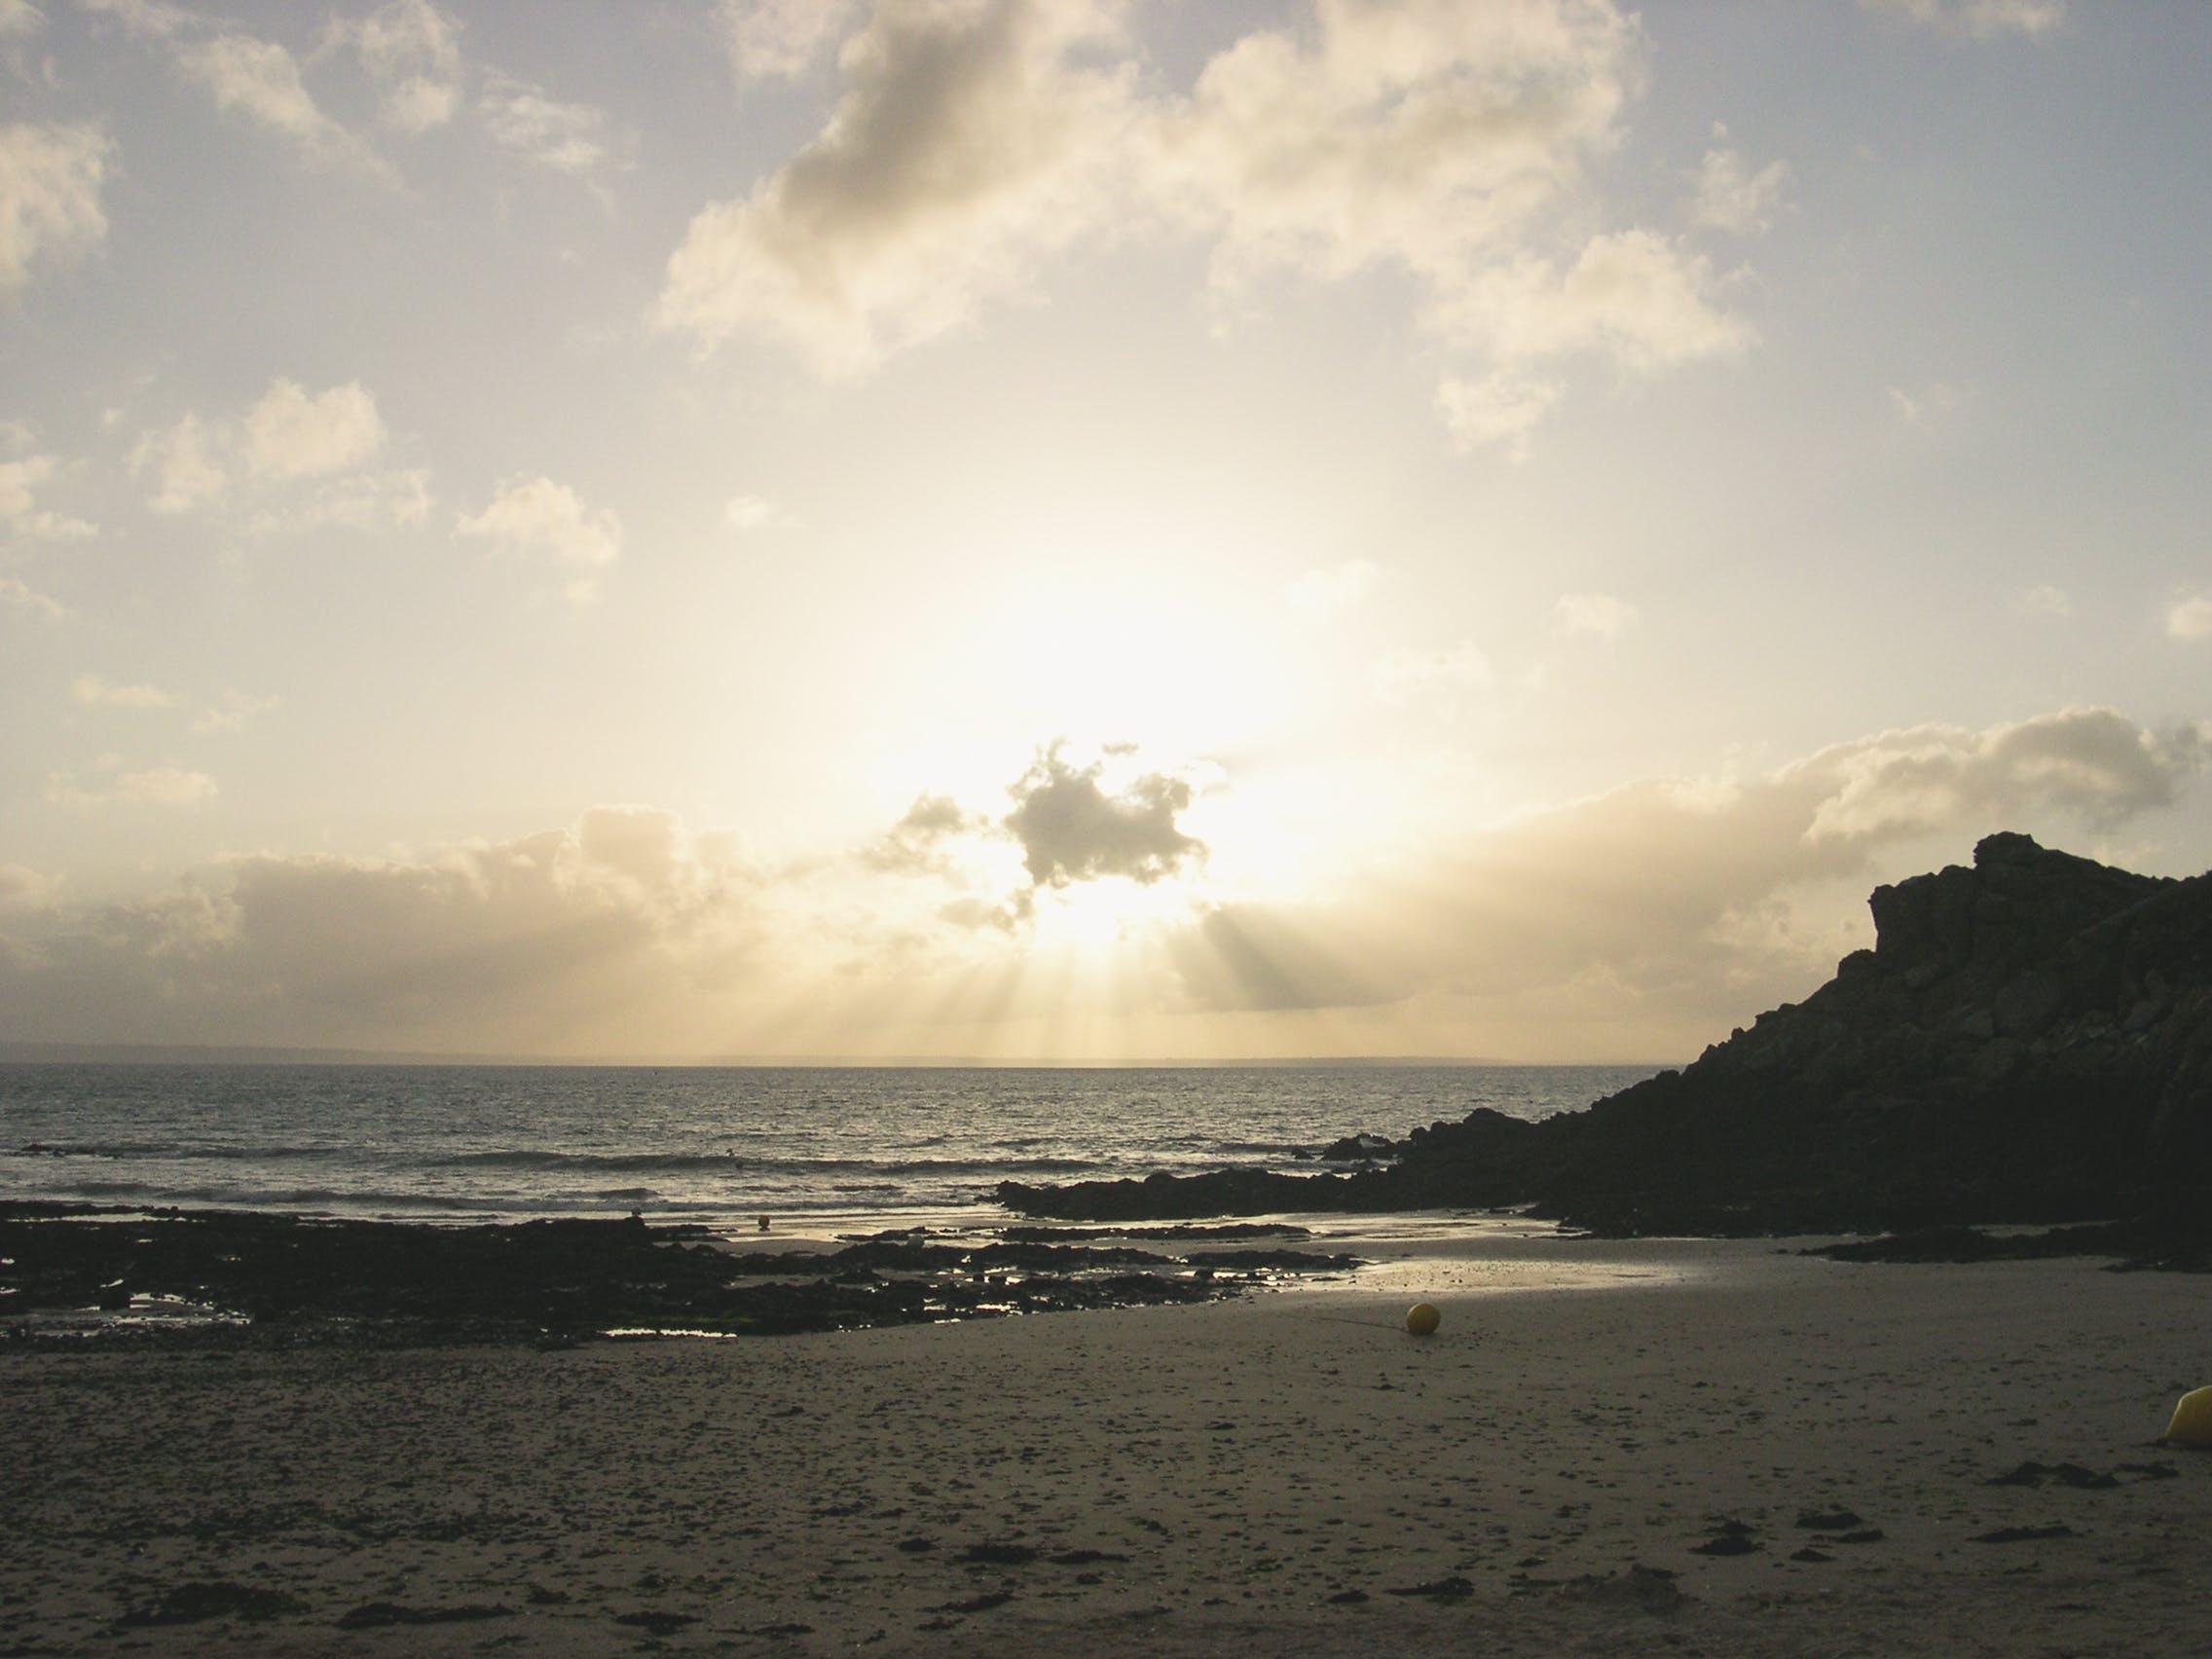 Free stock photo of beach, britain, cloud, cloudy